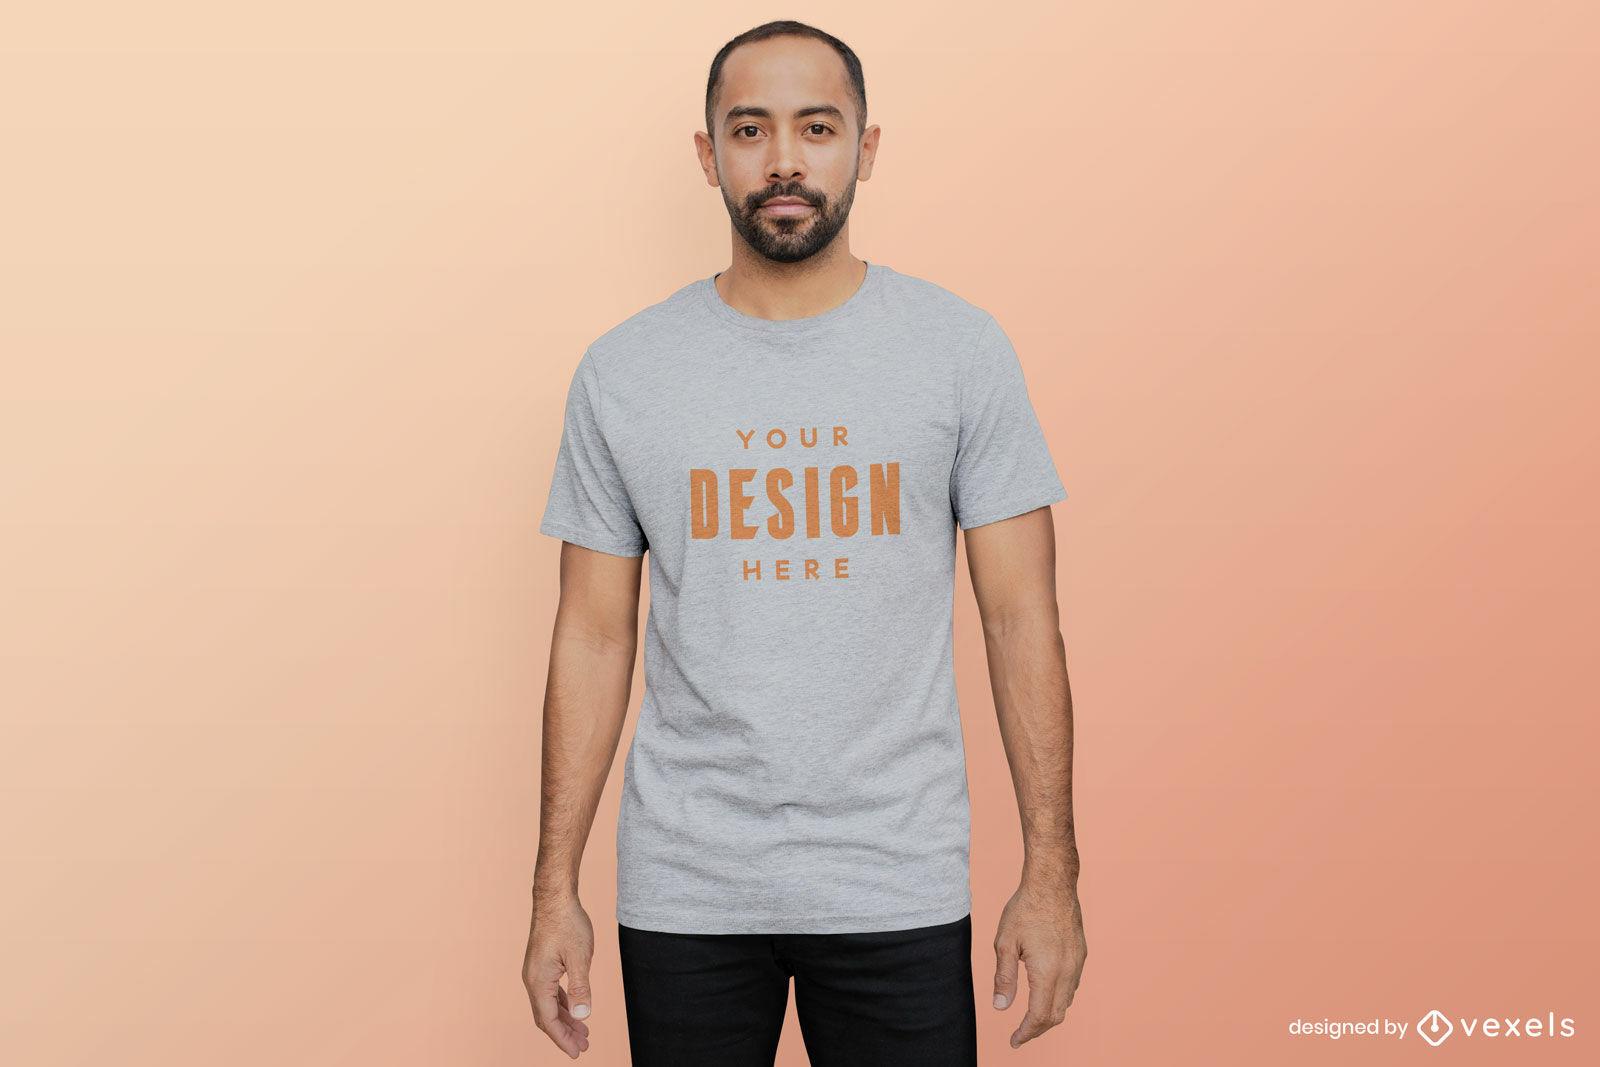 Man in grey t-shirt mockup orange background